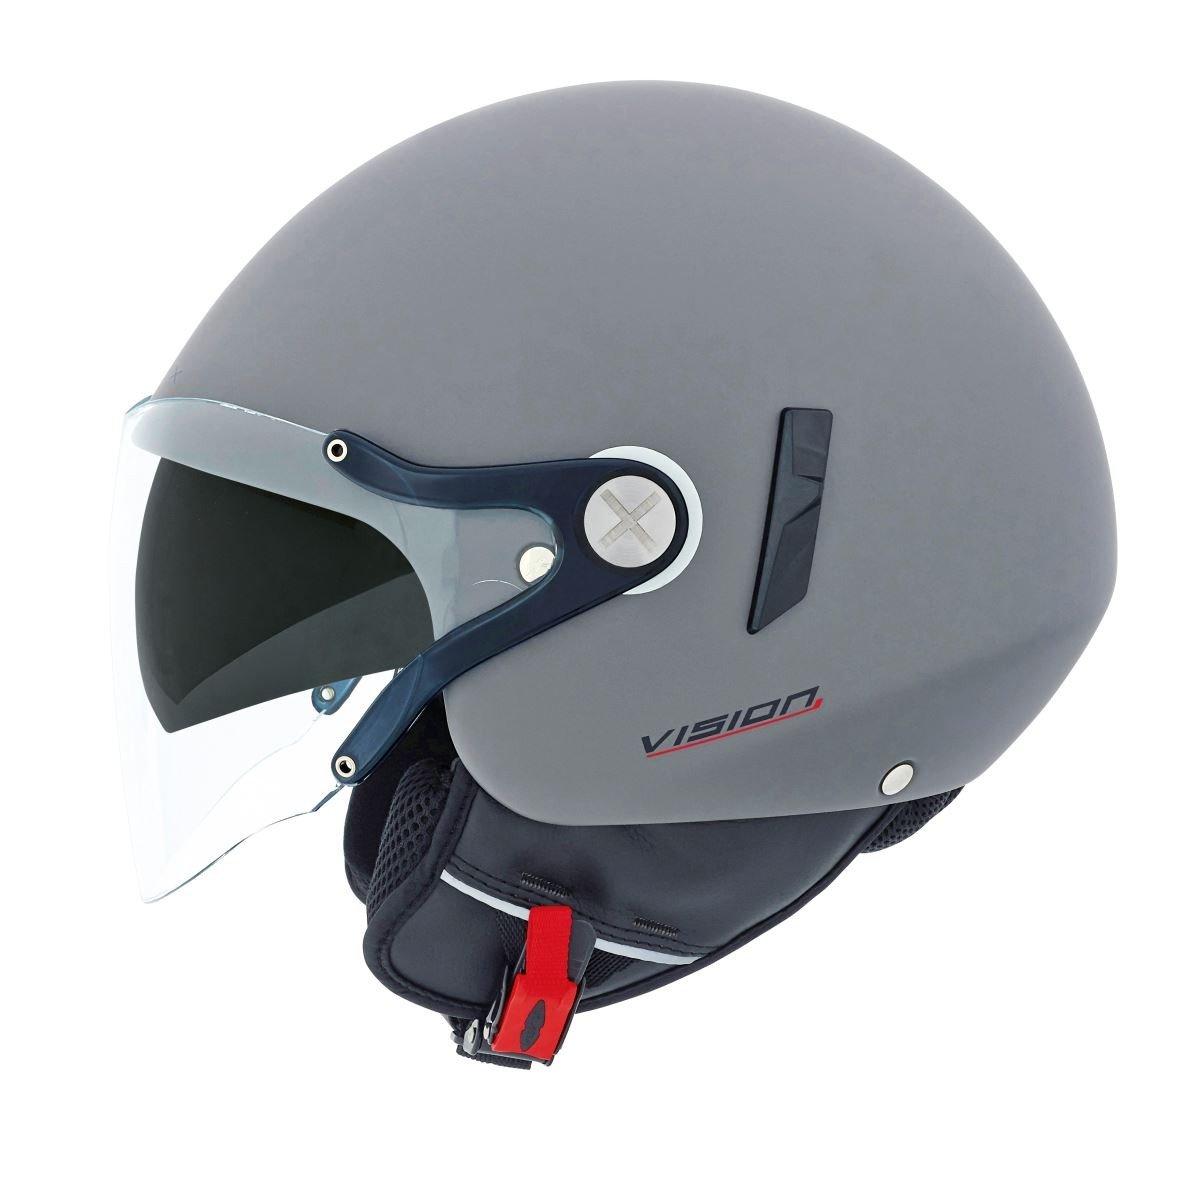 Motorcycle Nexx X60 Vision Flex 2 Helmet Anthracite S Nexx Helmets 01X604208204200 S